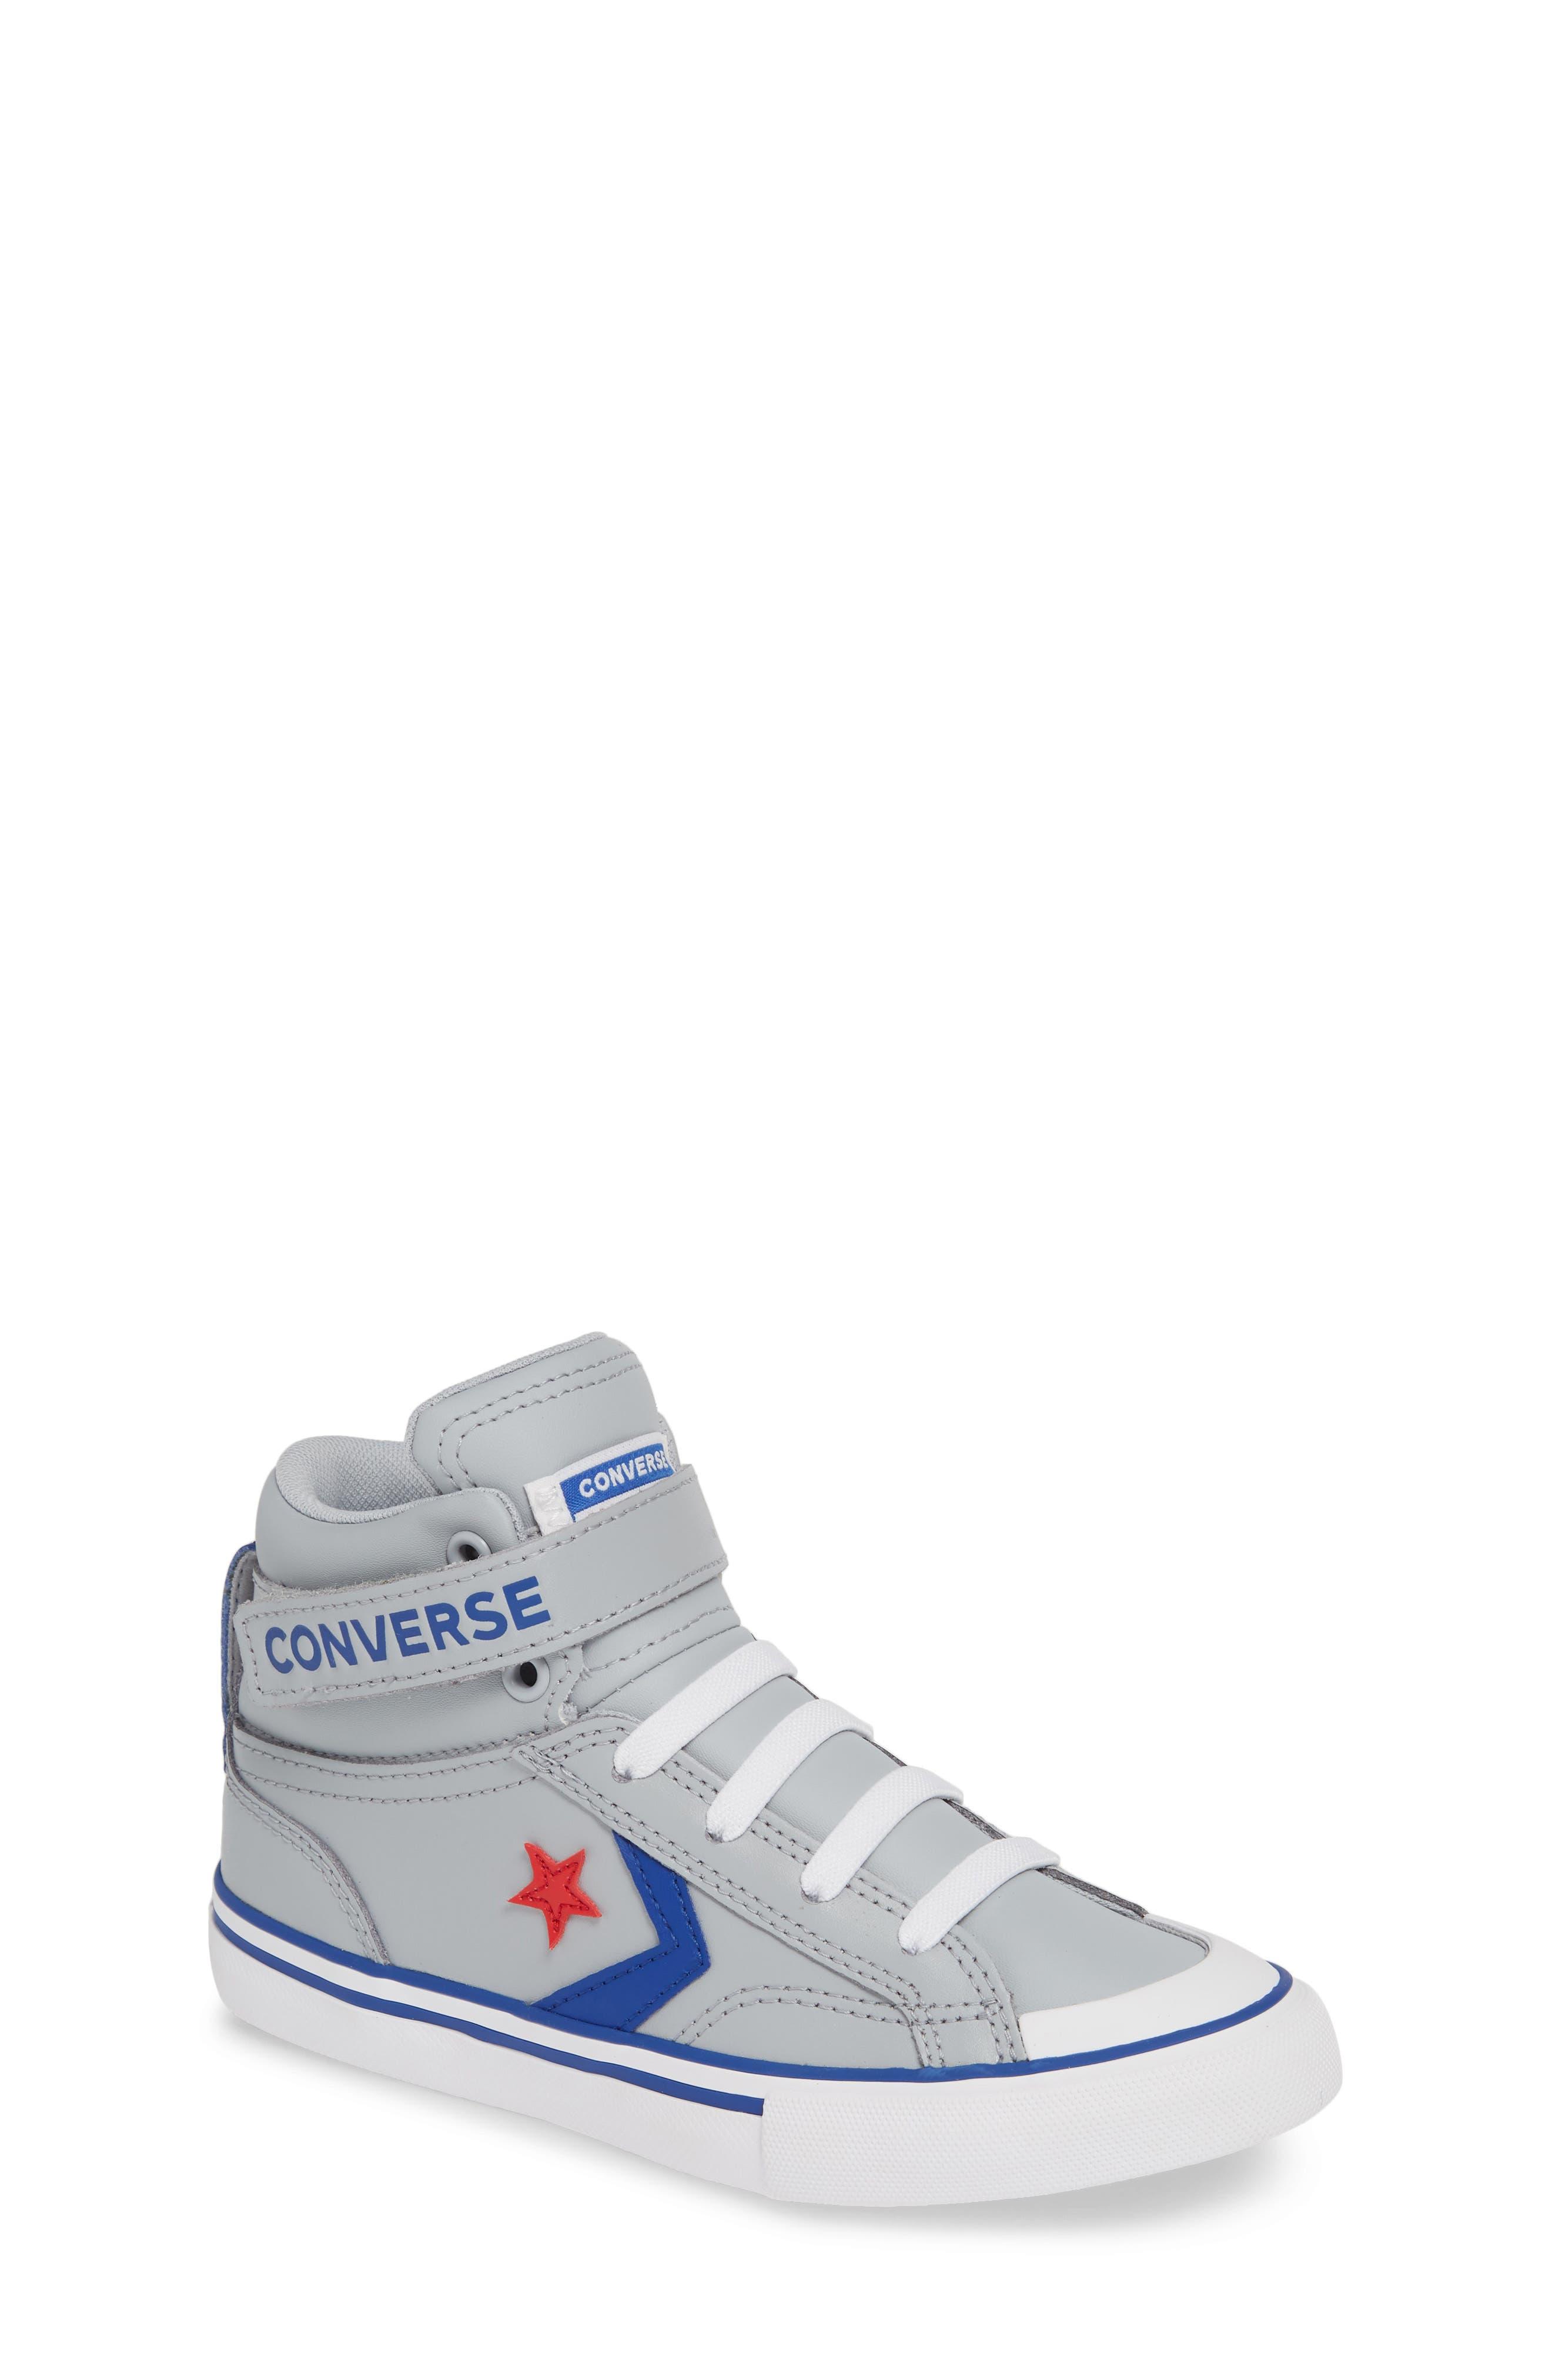 163c220285b43a Converse Kids  Grey Shoes   Snekers